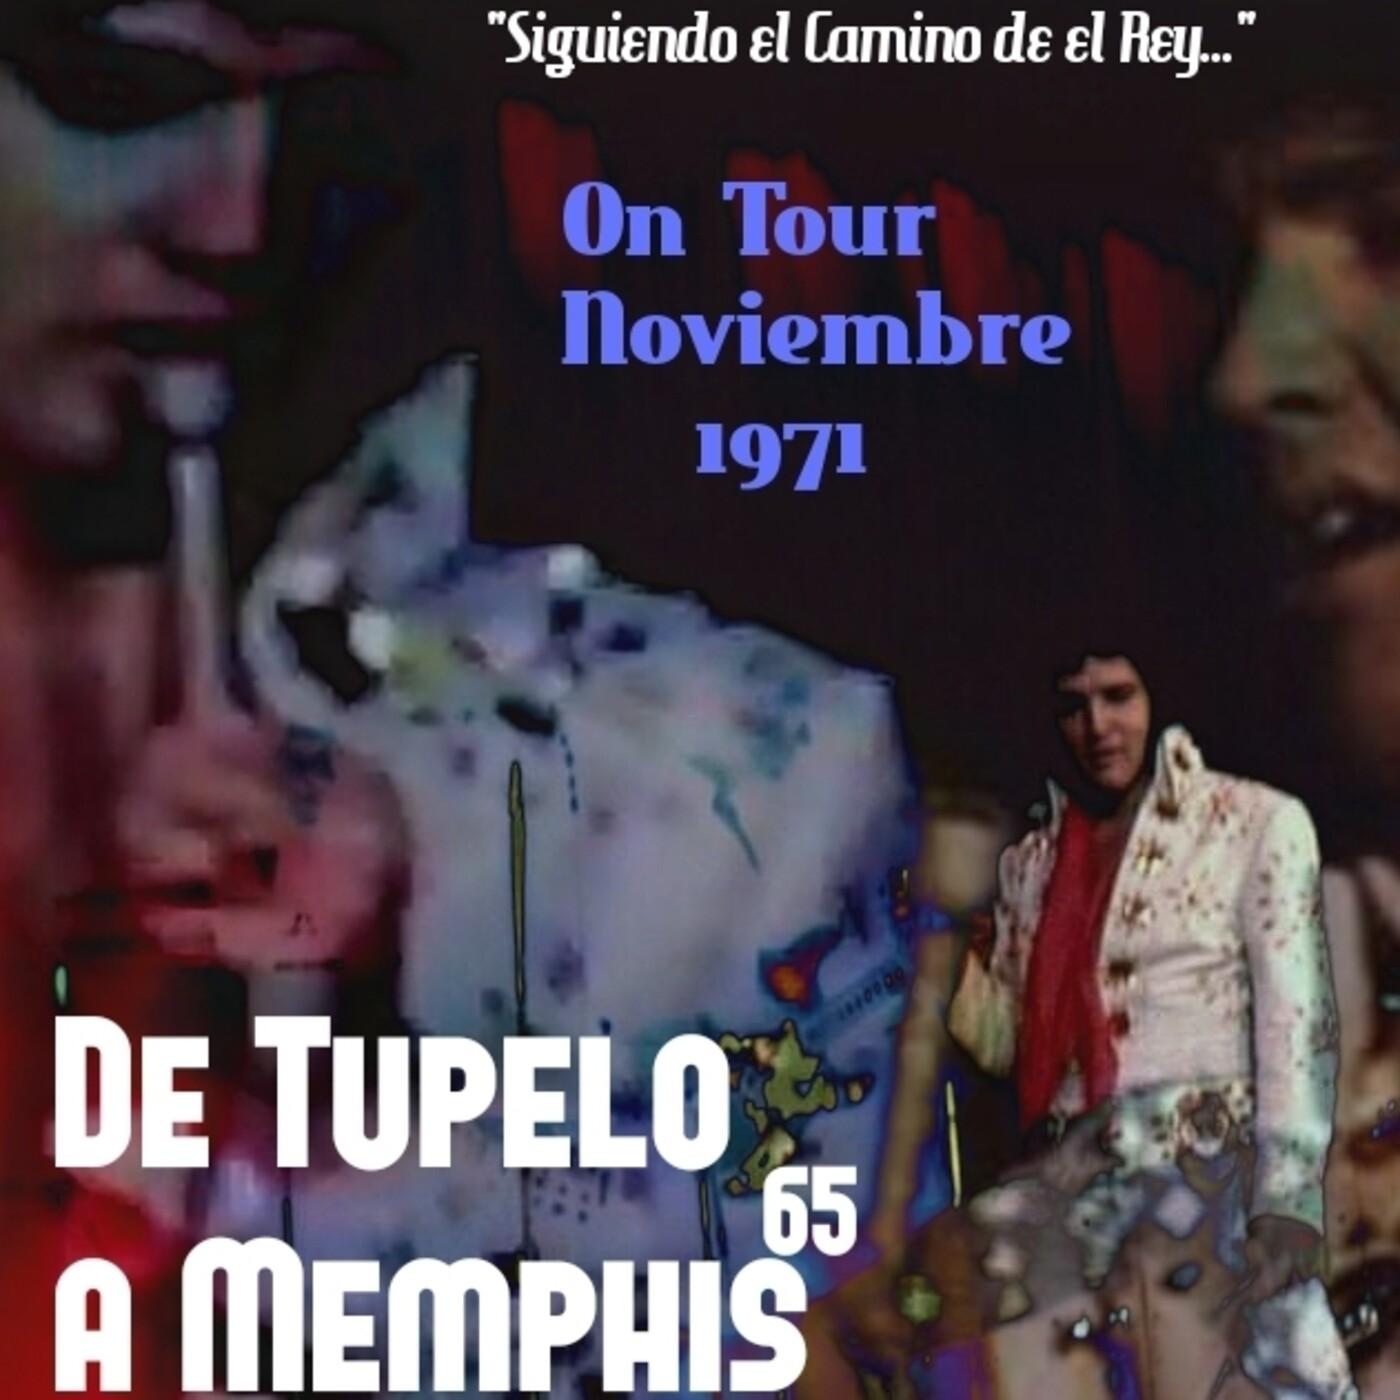 De Tupelo a Memphis 65. On Tour , Noviembre 1971